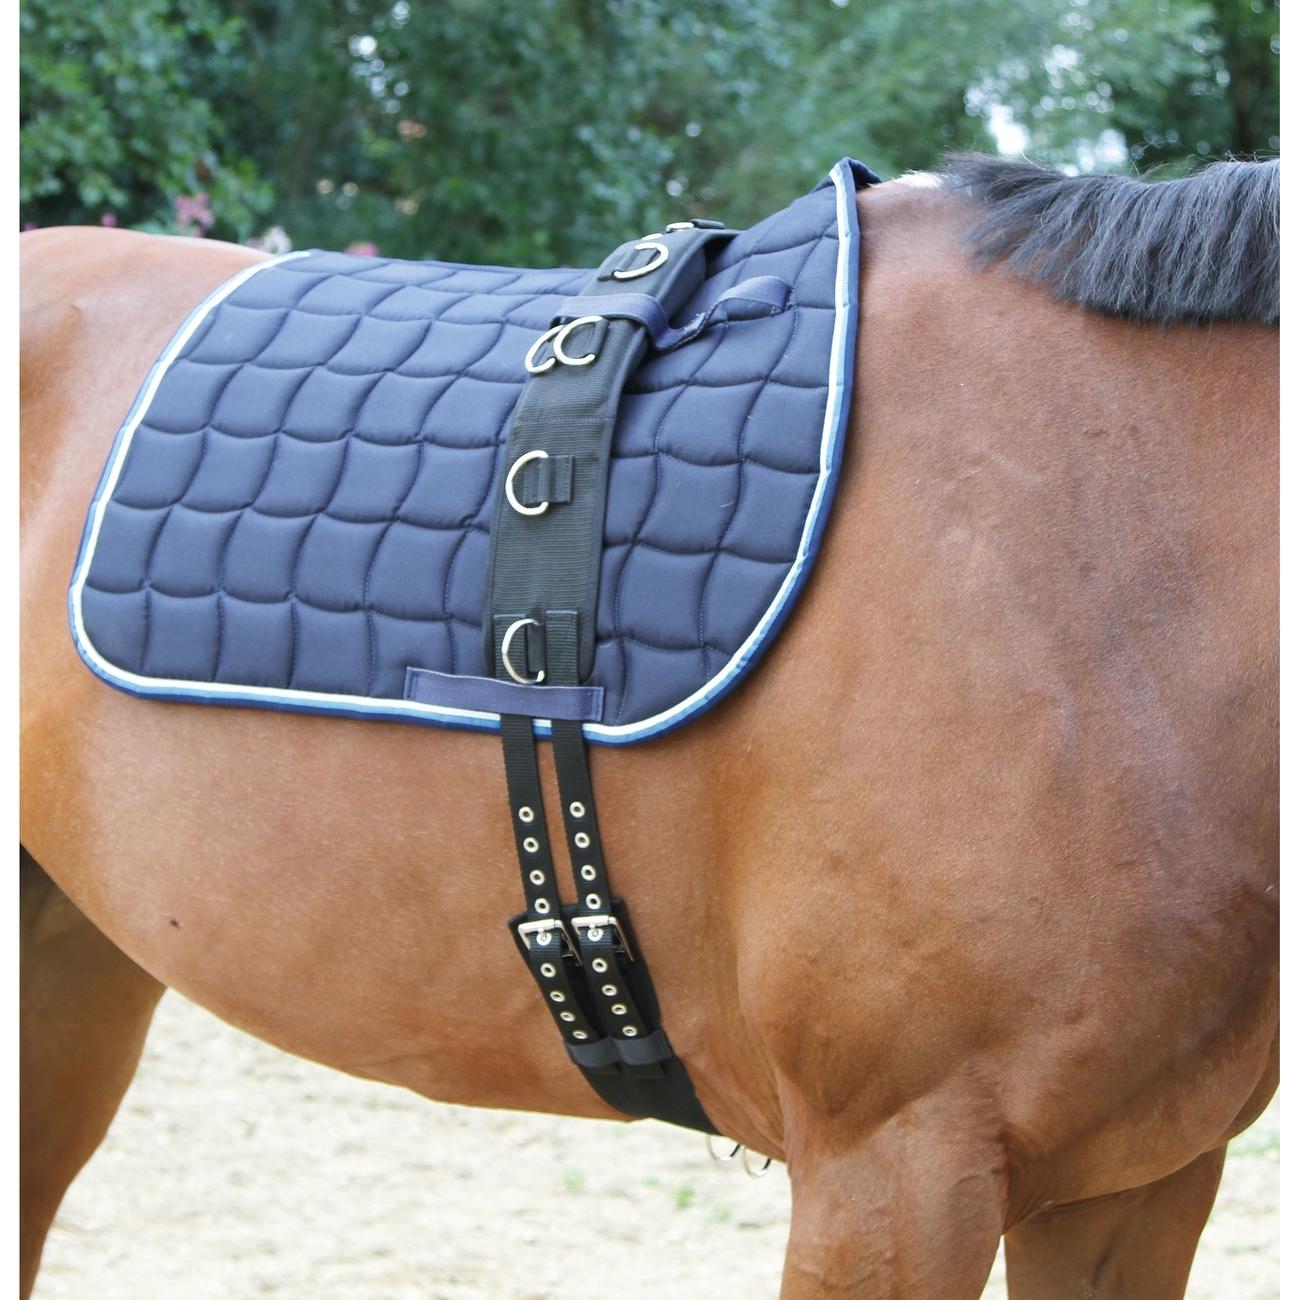 Kerbl Covalliero Longiergurt Nylon mit 9 Ringen, Pony (160-200 cm Umfang)